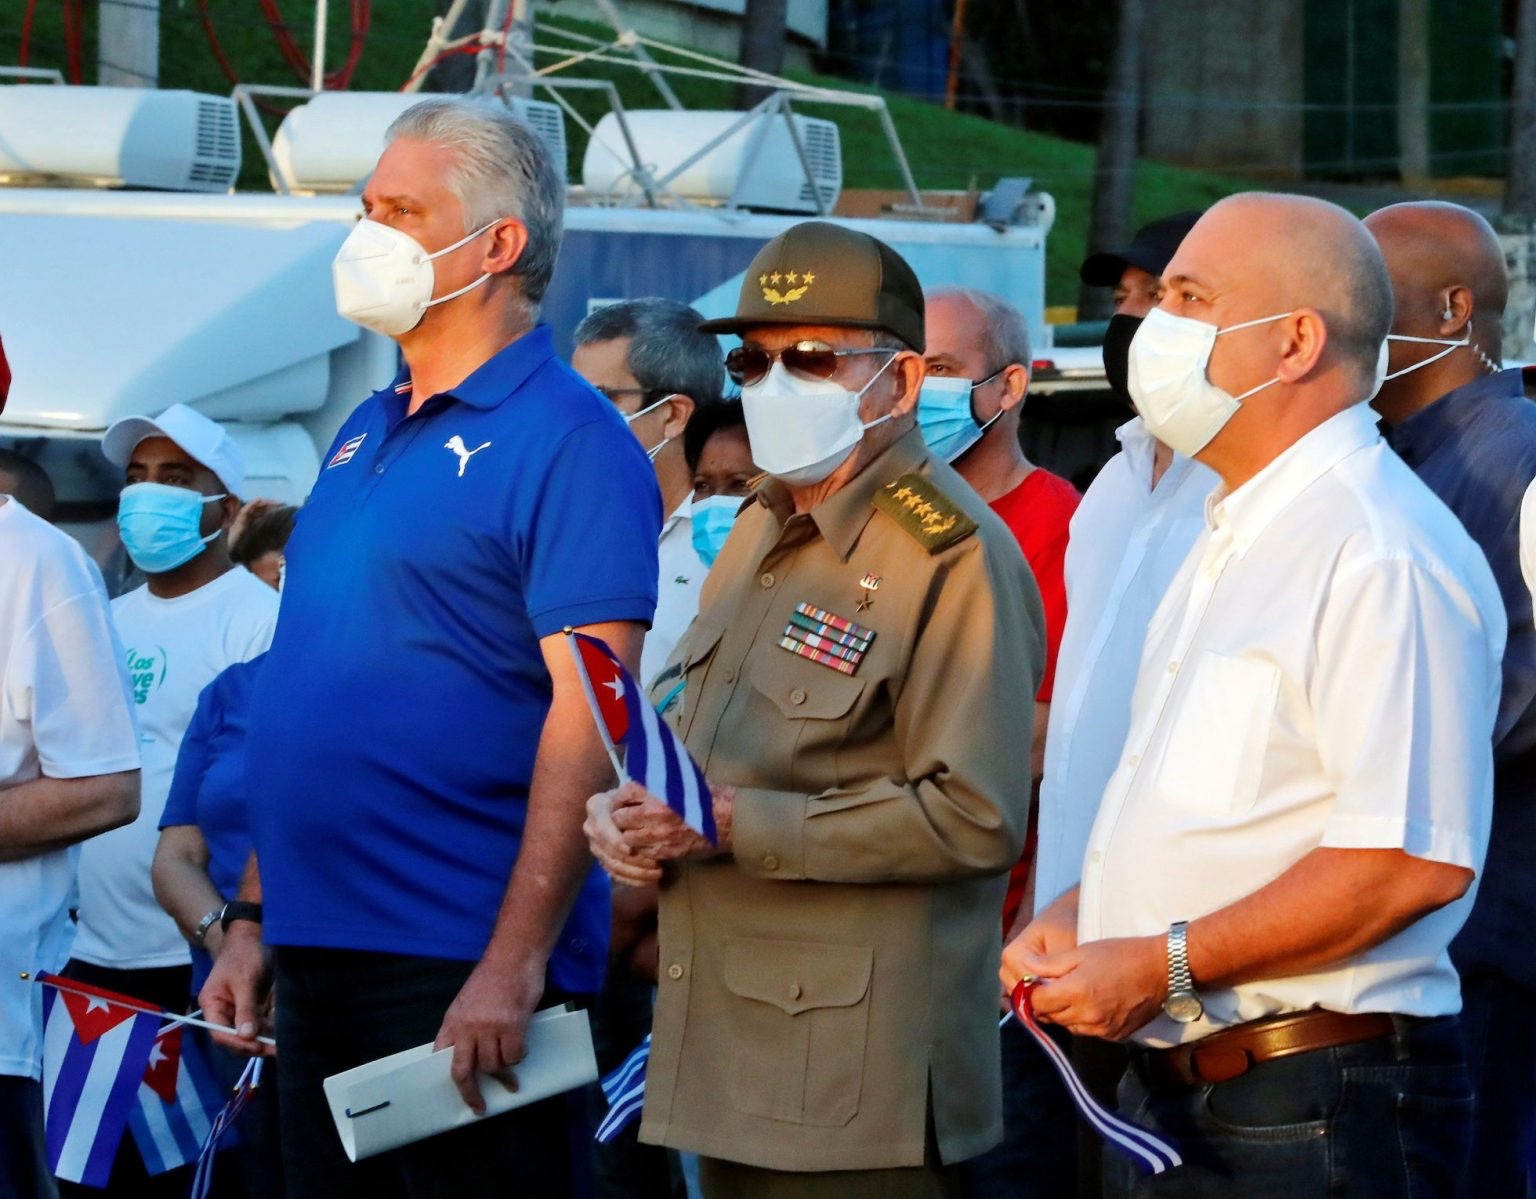 Ditadura promove comício em Cuba após protestos pró-democracia